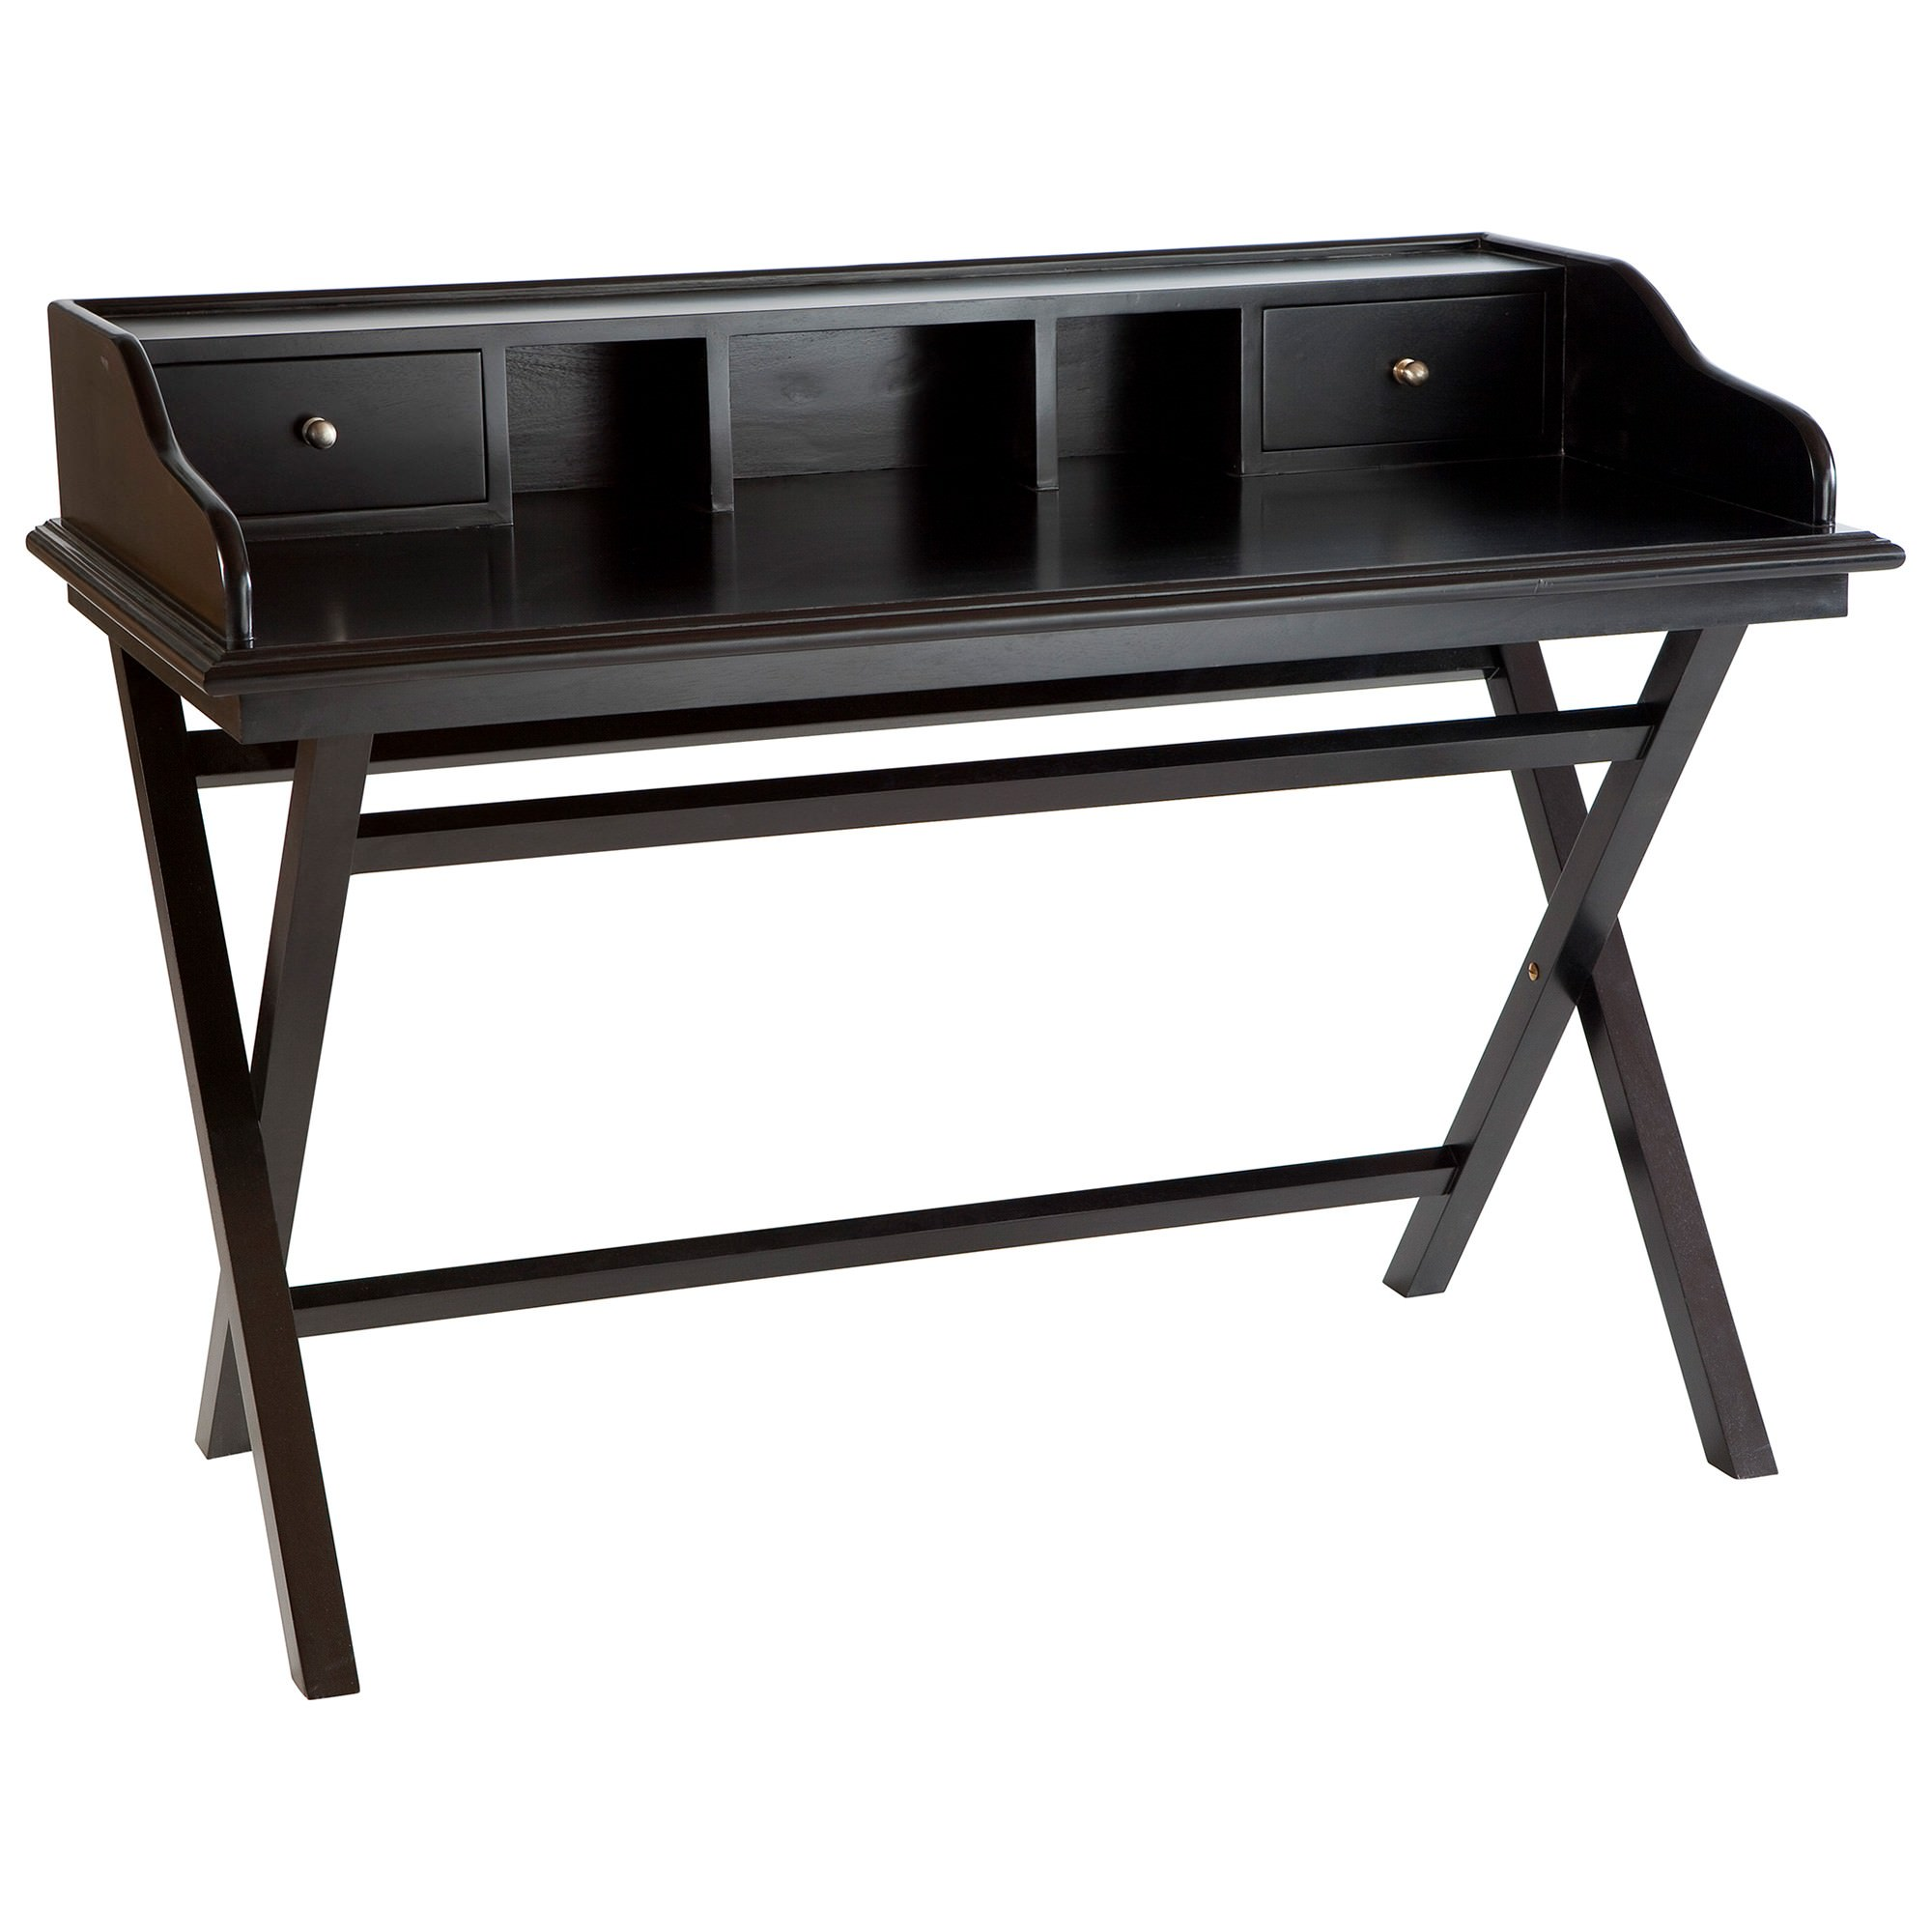 Whitehall Mahogany Timber Secretary Desk, 130cm, Black